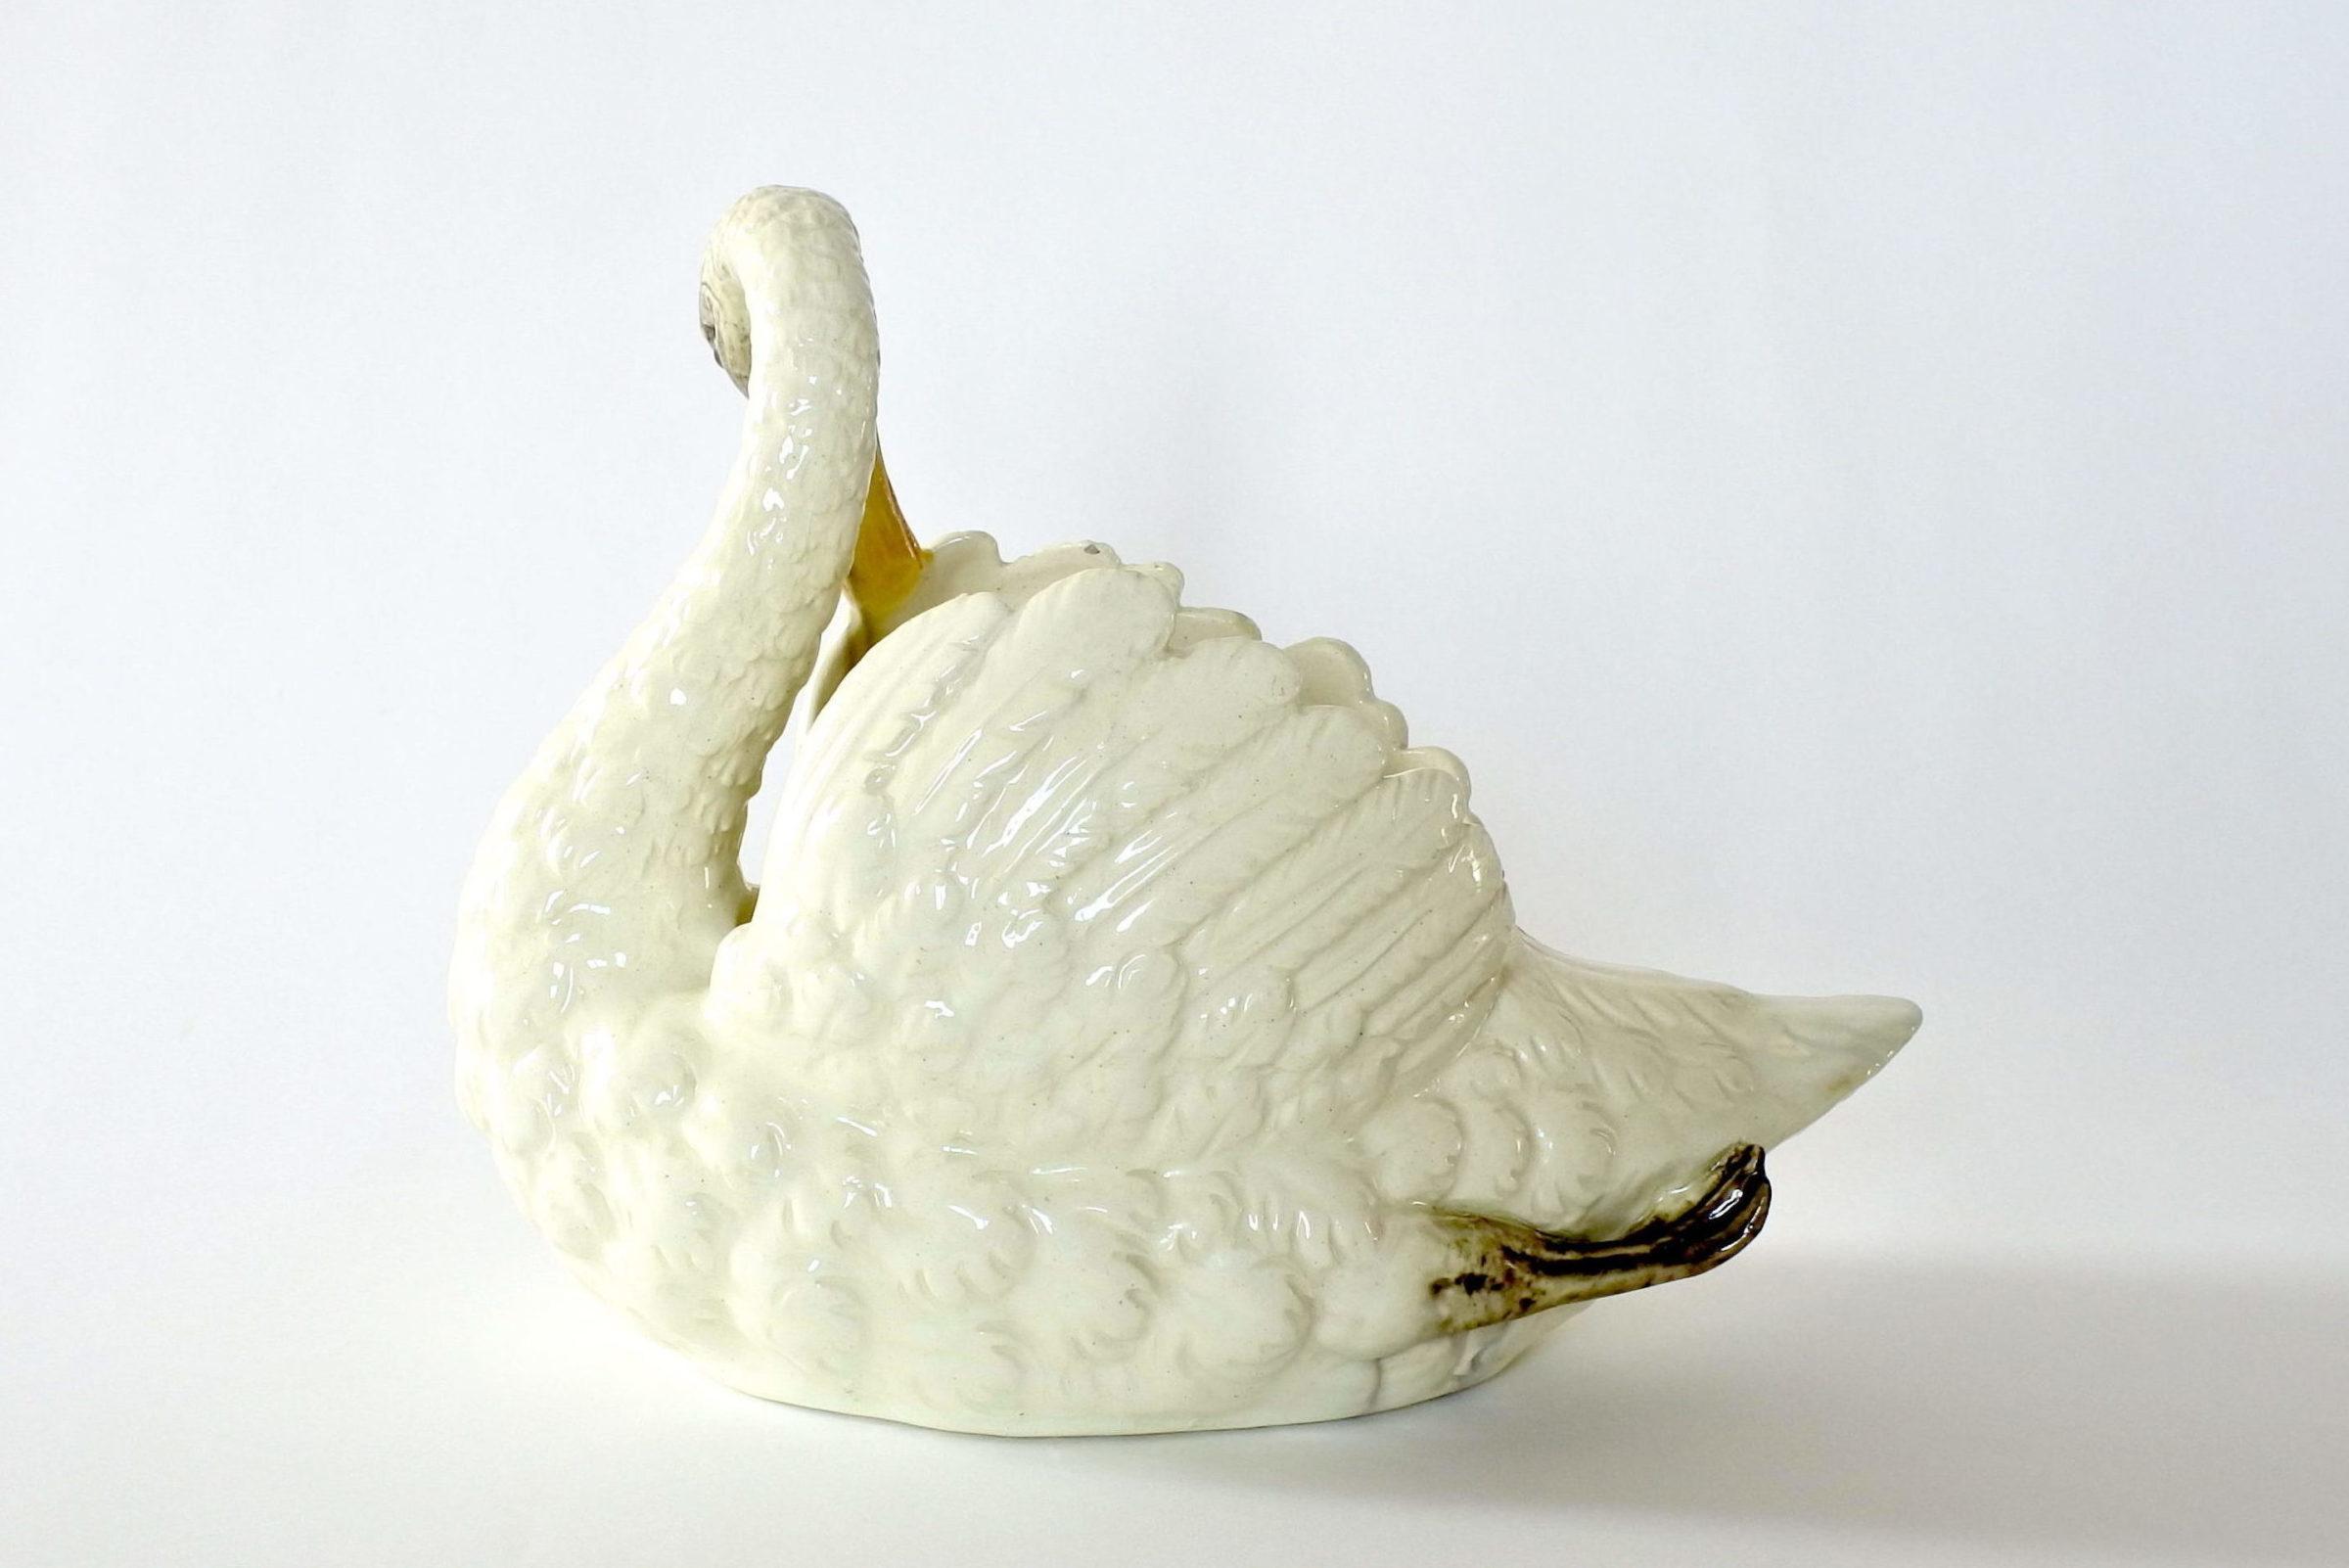 Cigno in ceramica barbotine con funzione di jardinière - Jérôme Massier Fils - 2